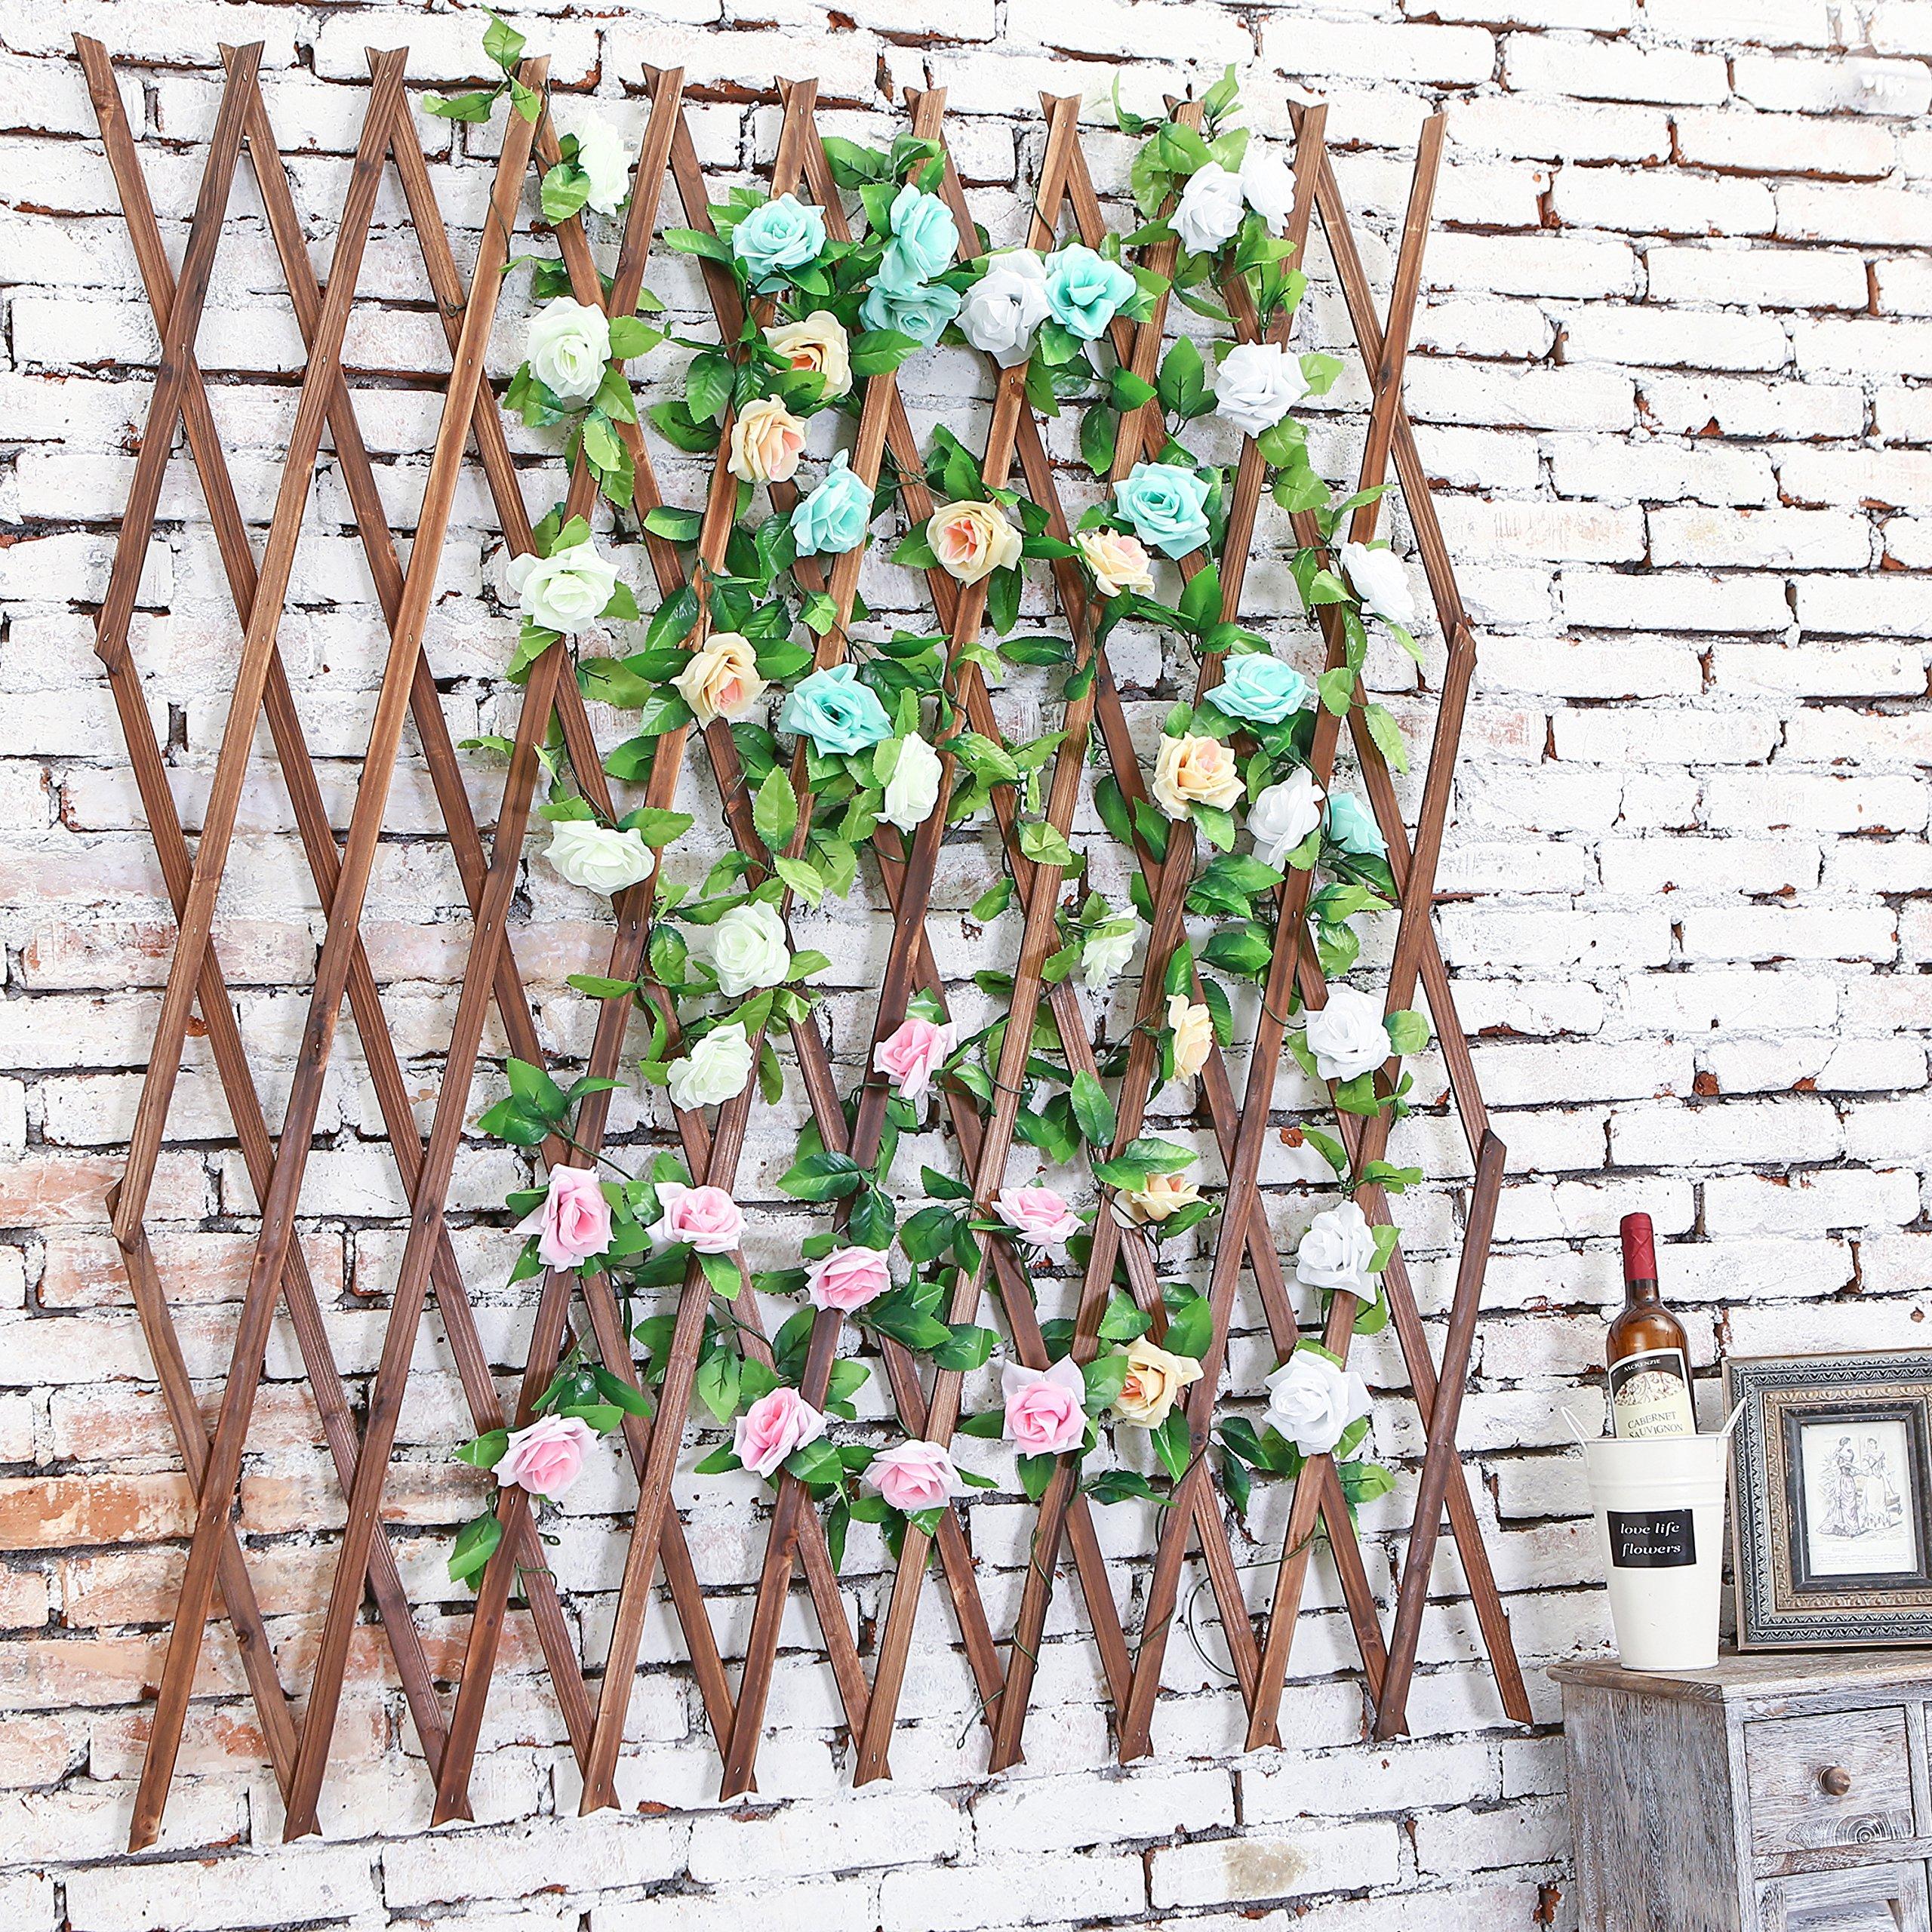 MyGift Wood Lattice Garden Trellis, Plant Display Screen w/Adjustable Width, Dark Brown by MyGift